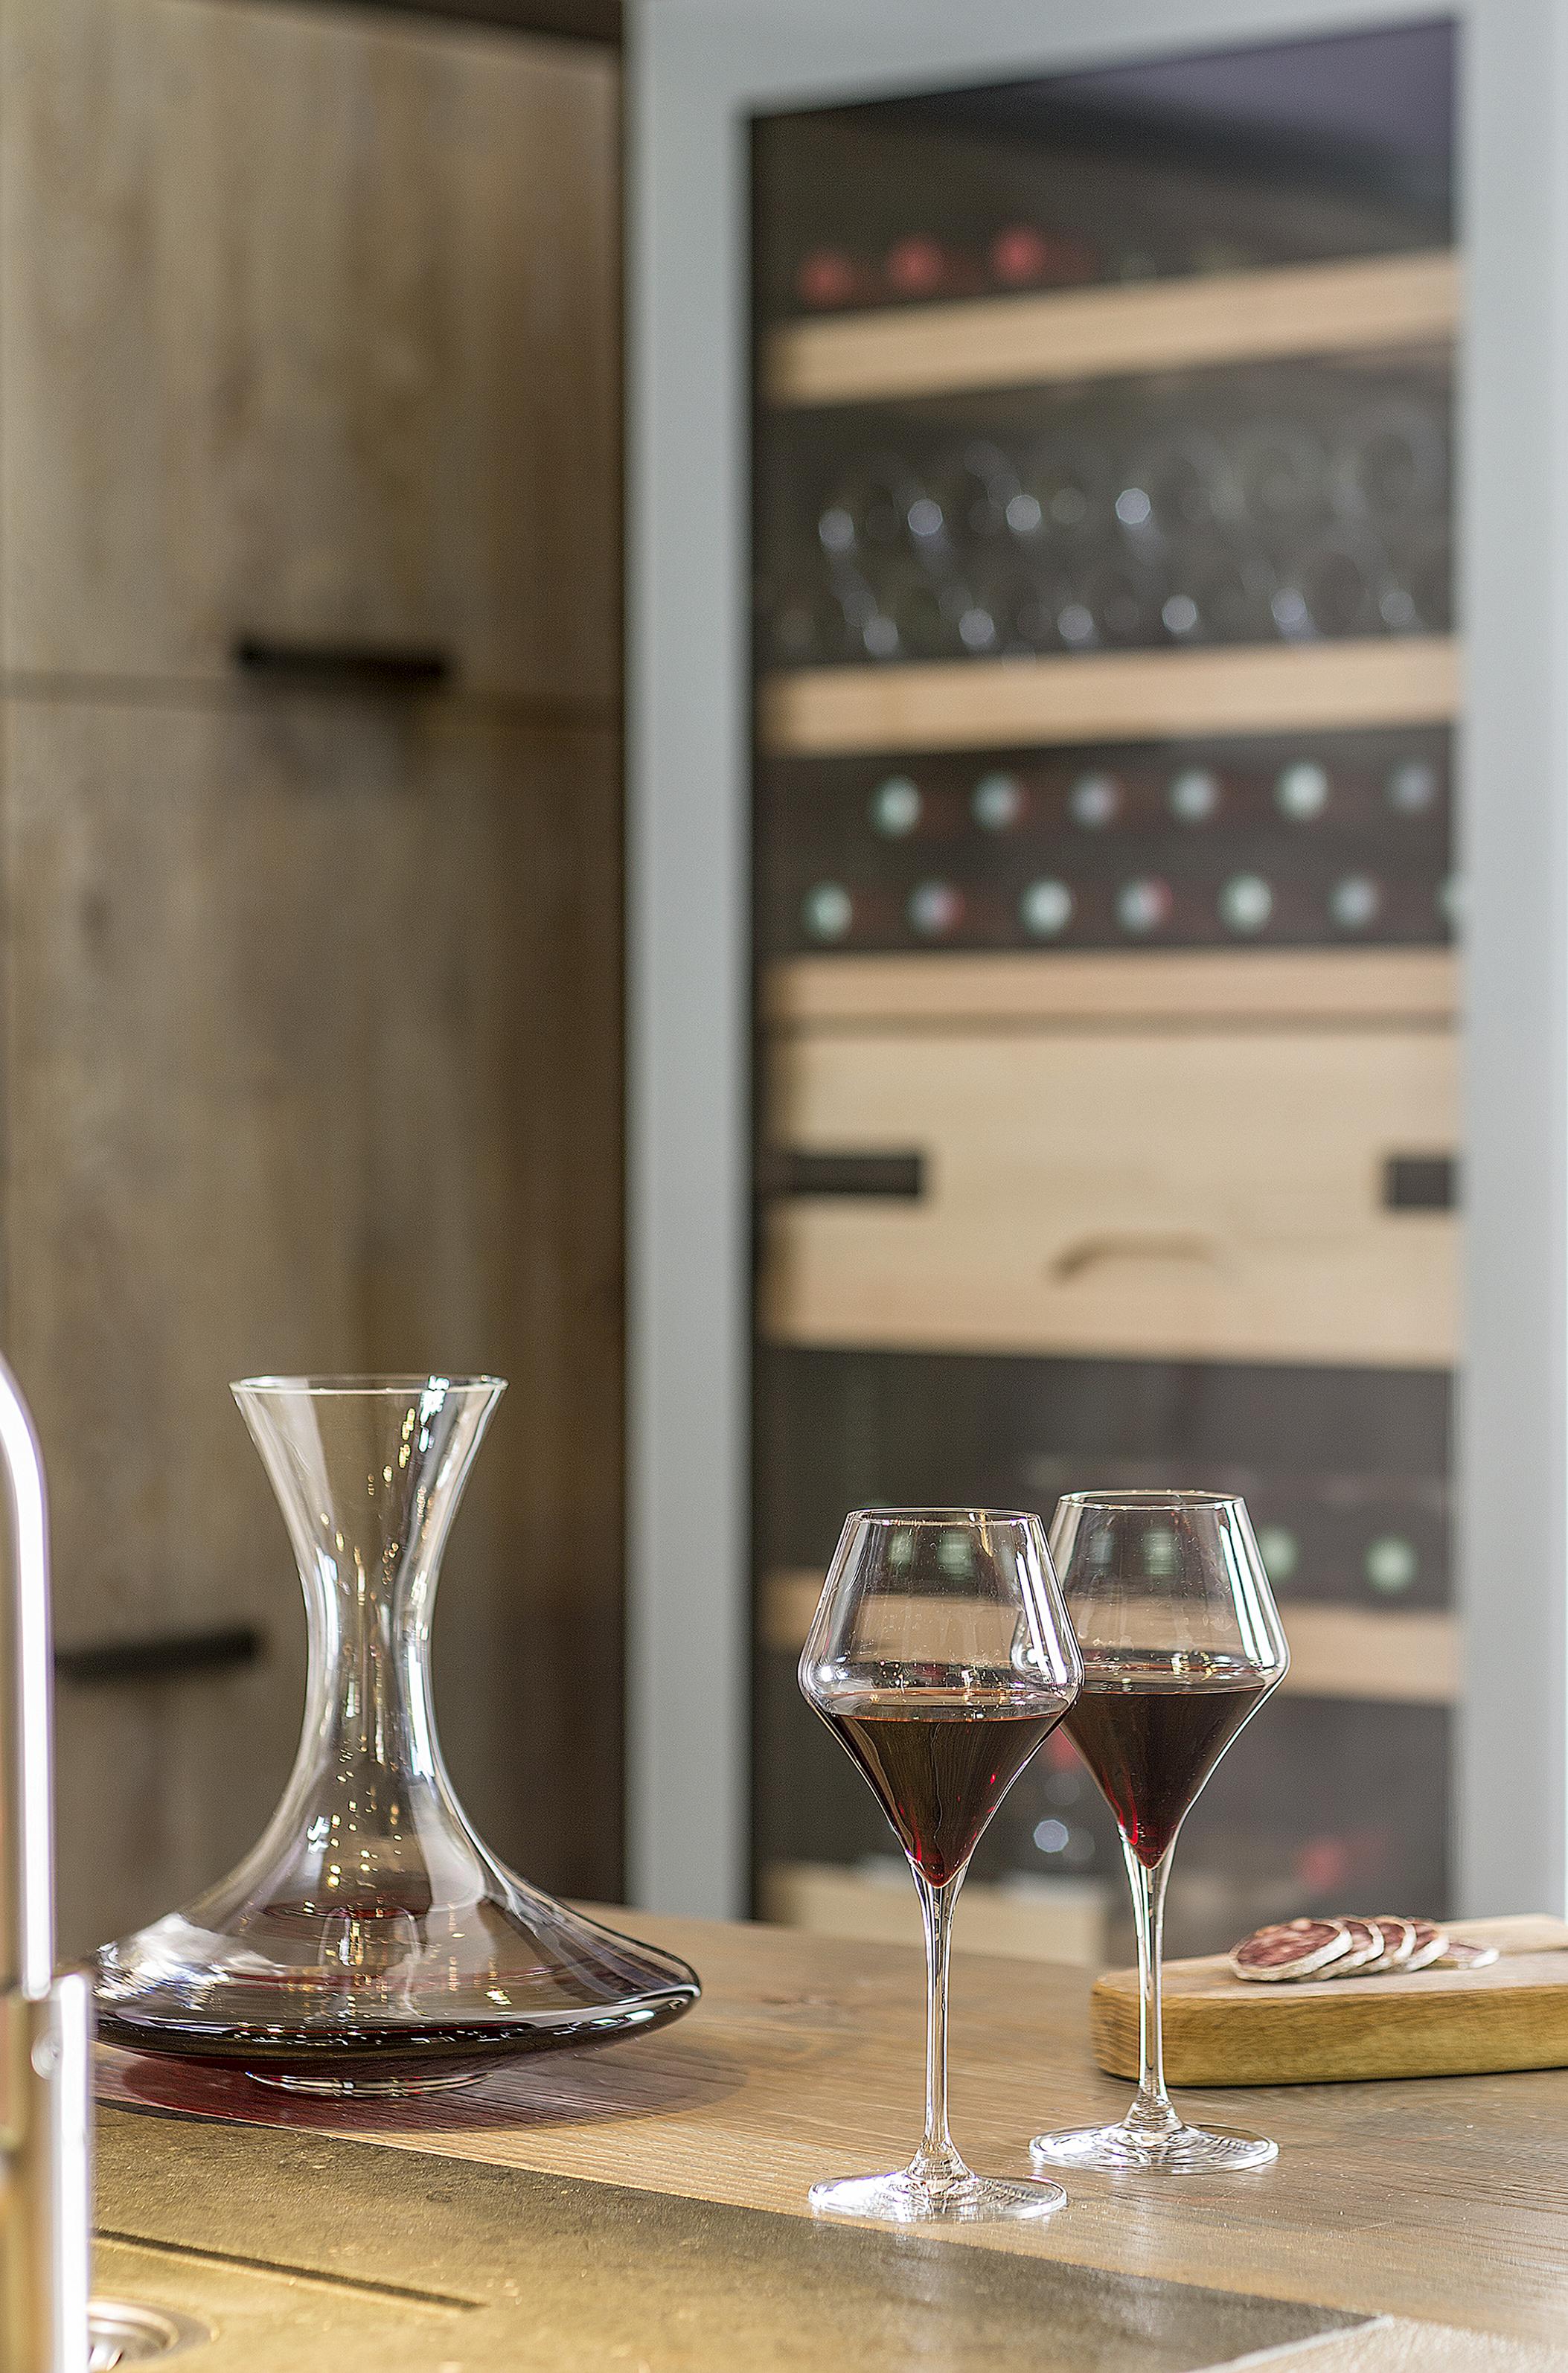 Lasommeli 233 Re Multifunction Wine Cabinet Vip265v W 70 X